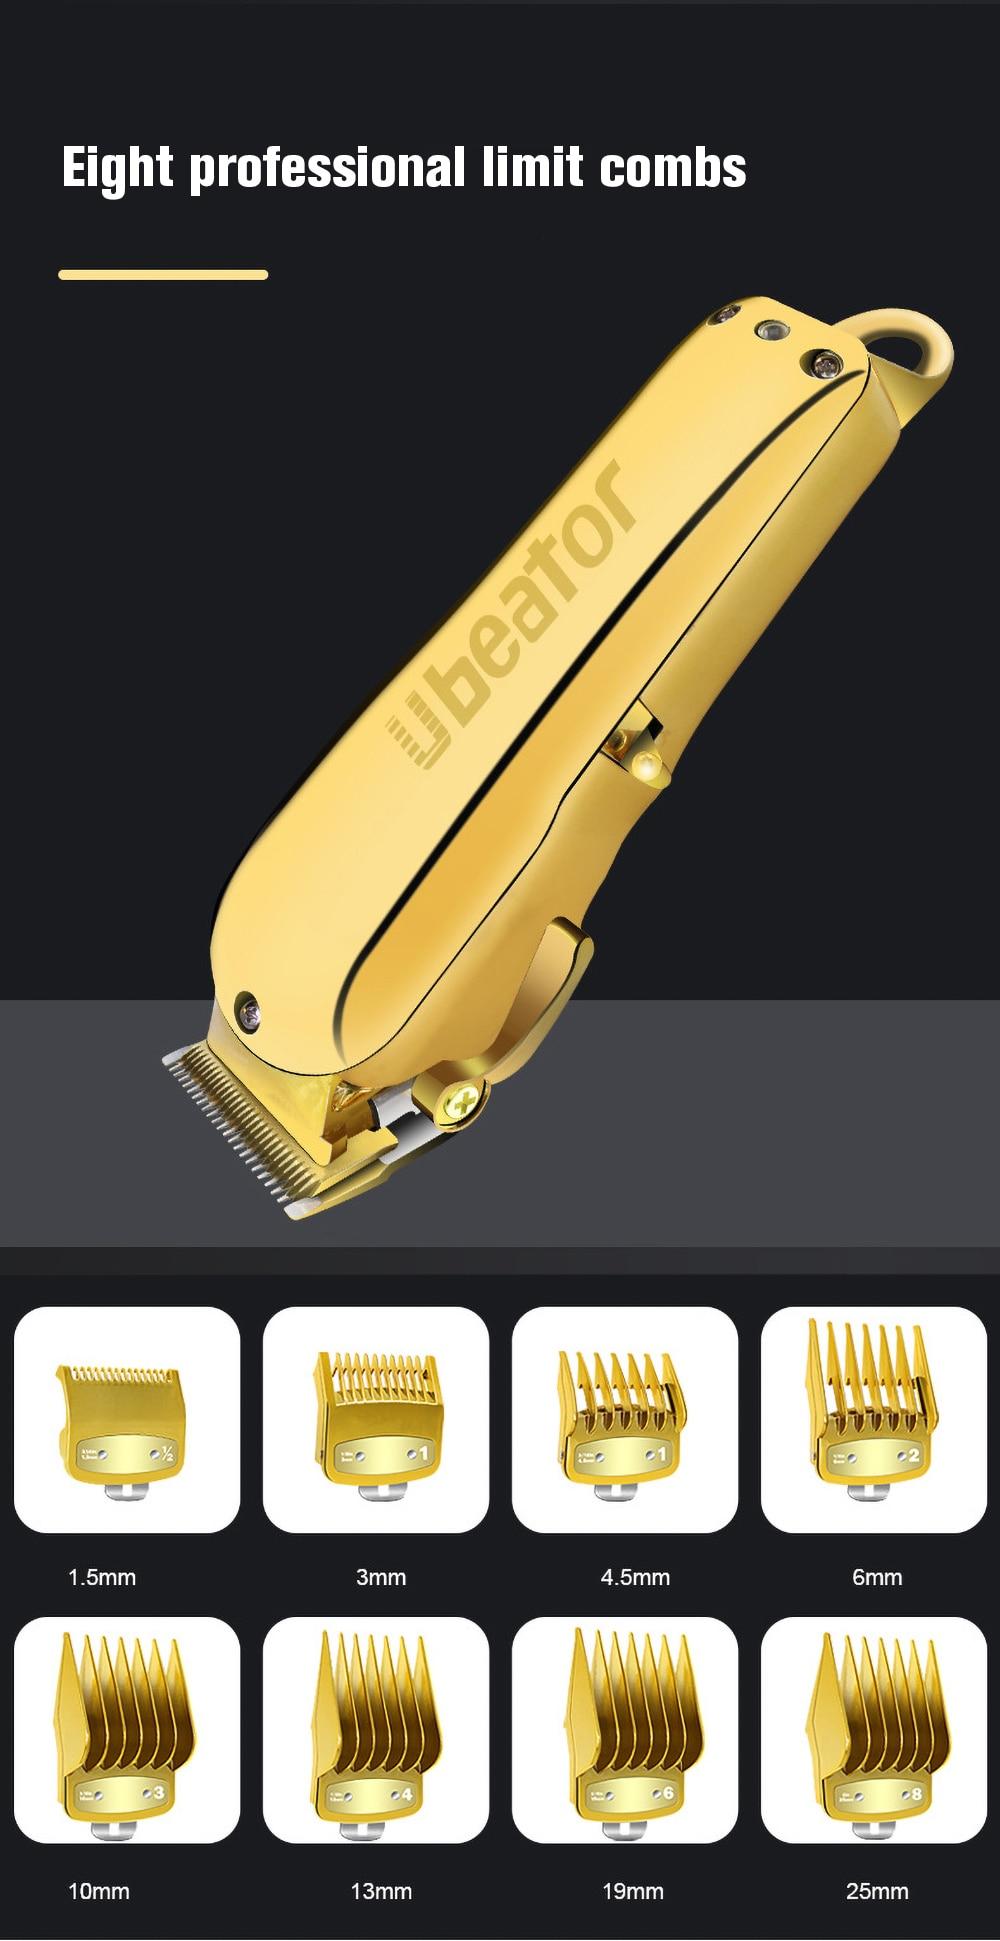 Novo all-metal profissional máquina de cortar cabelo